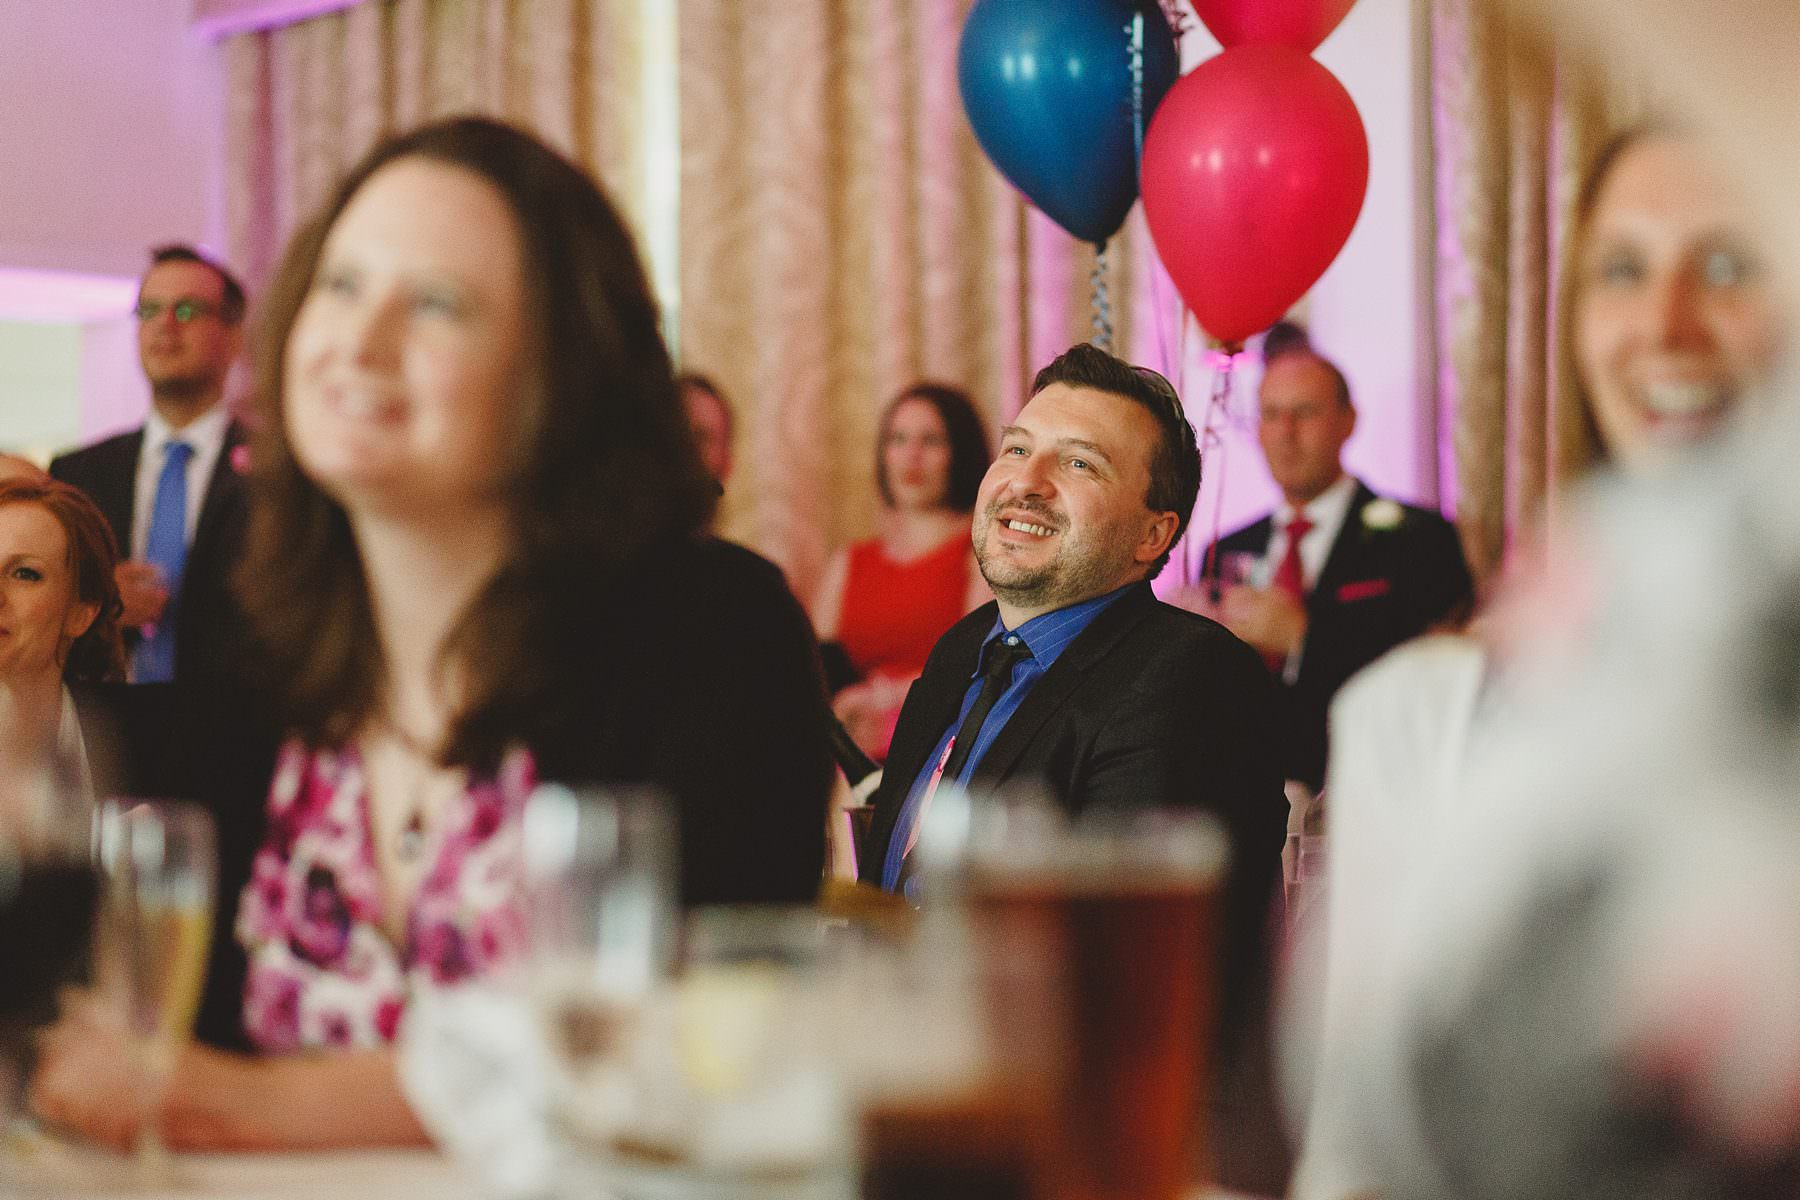 weddings-at-bristol-zoo-032